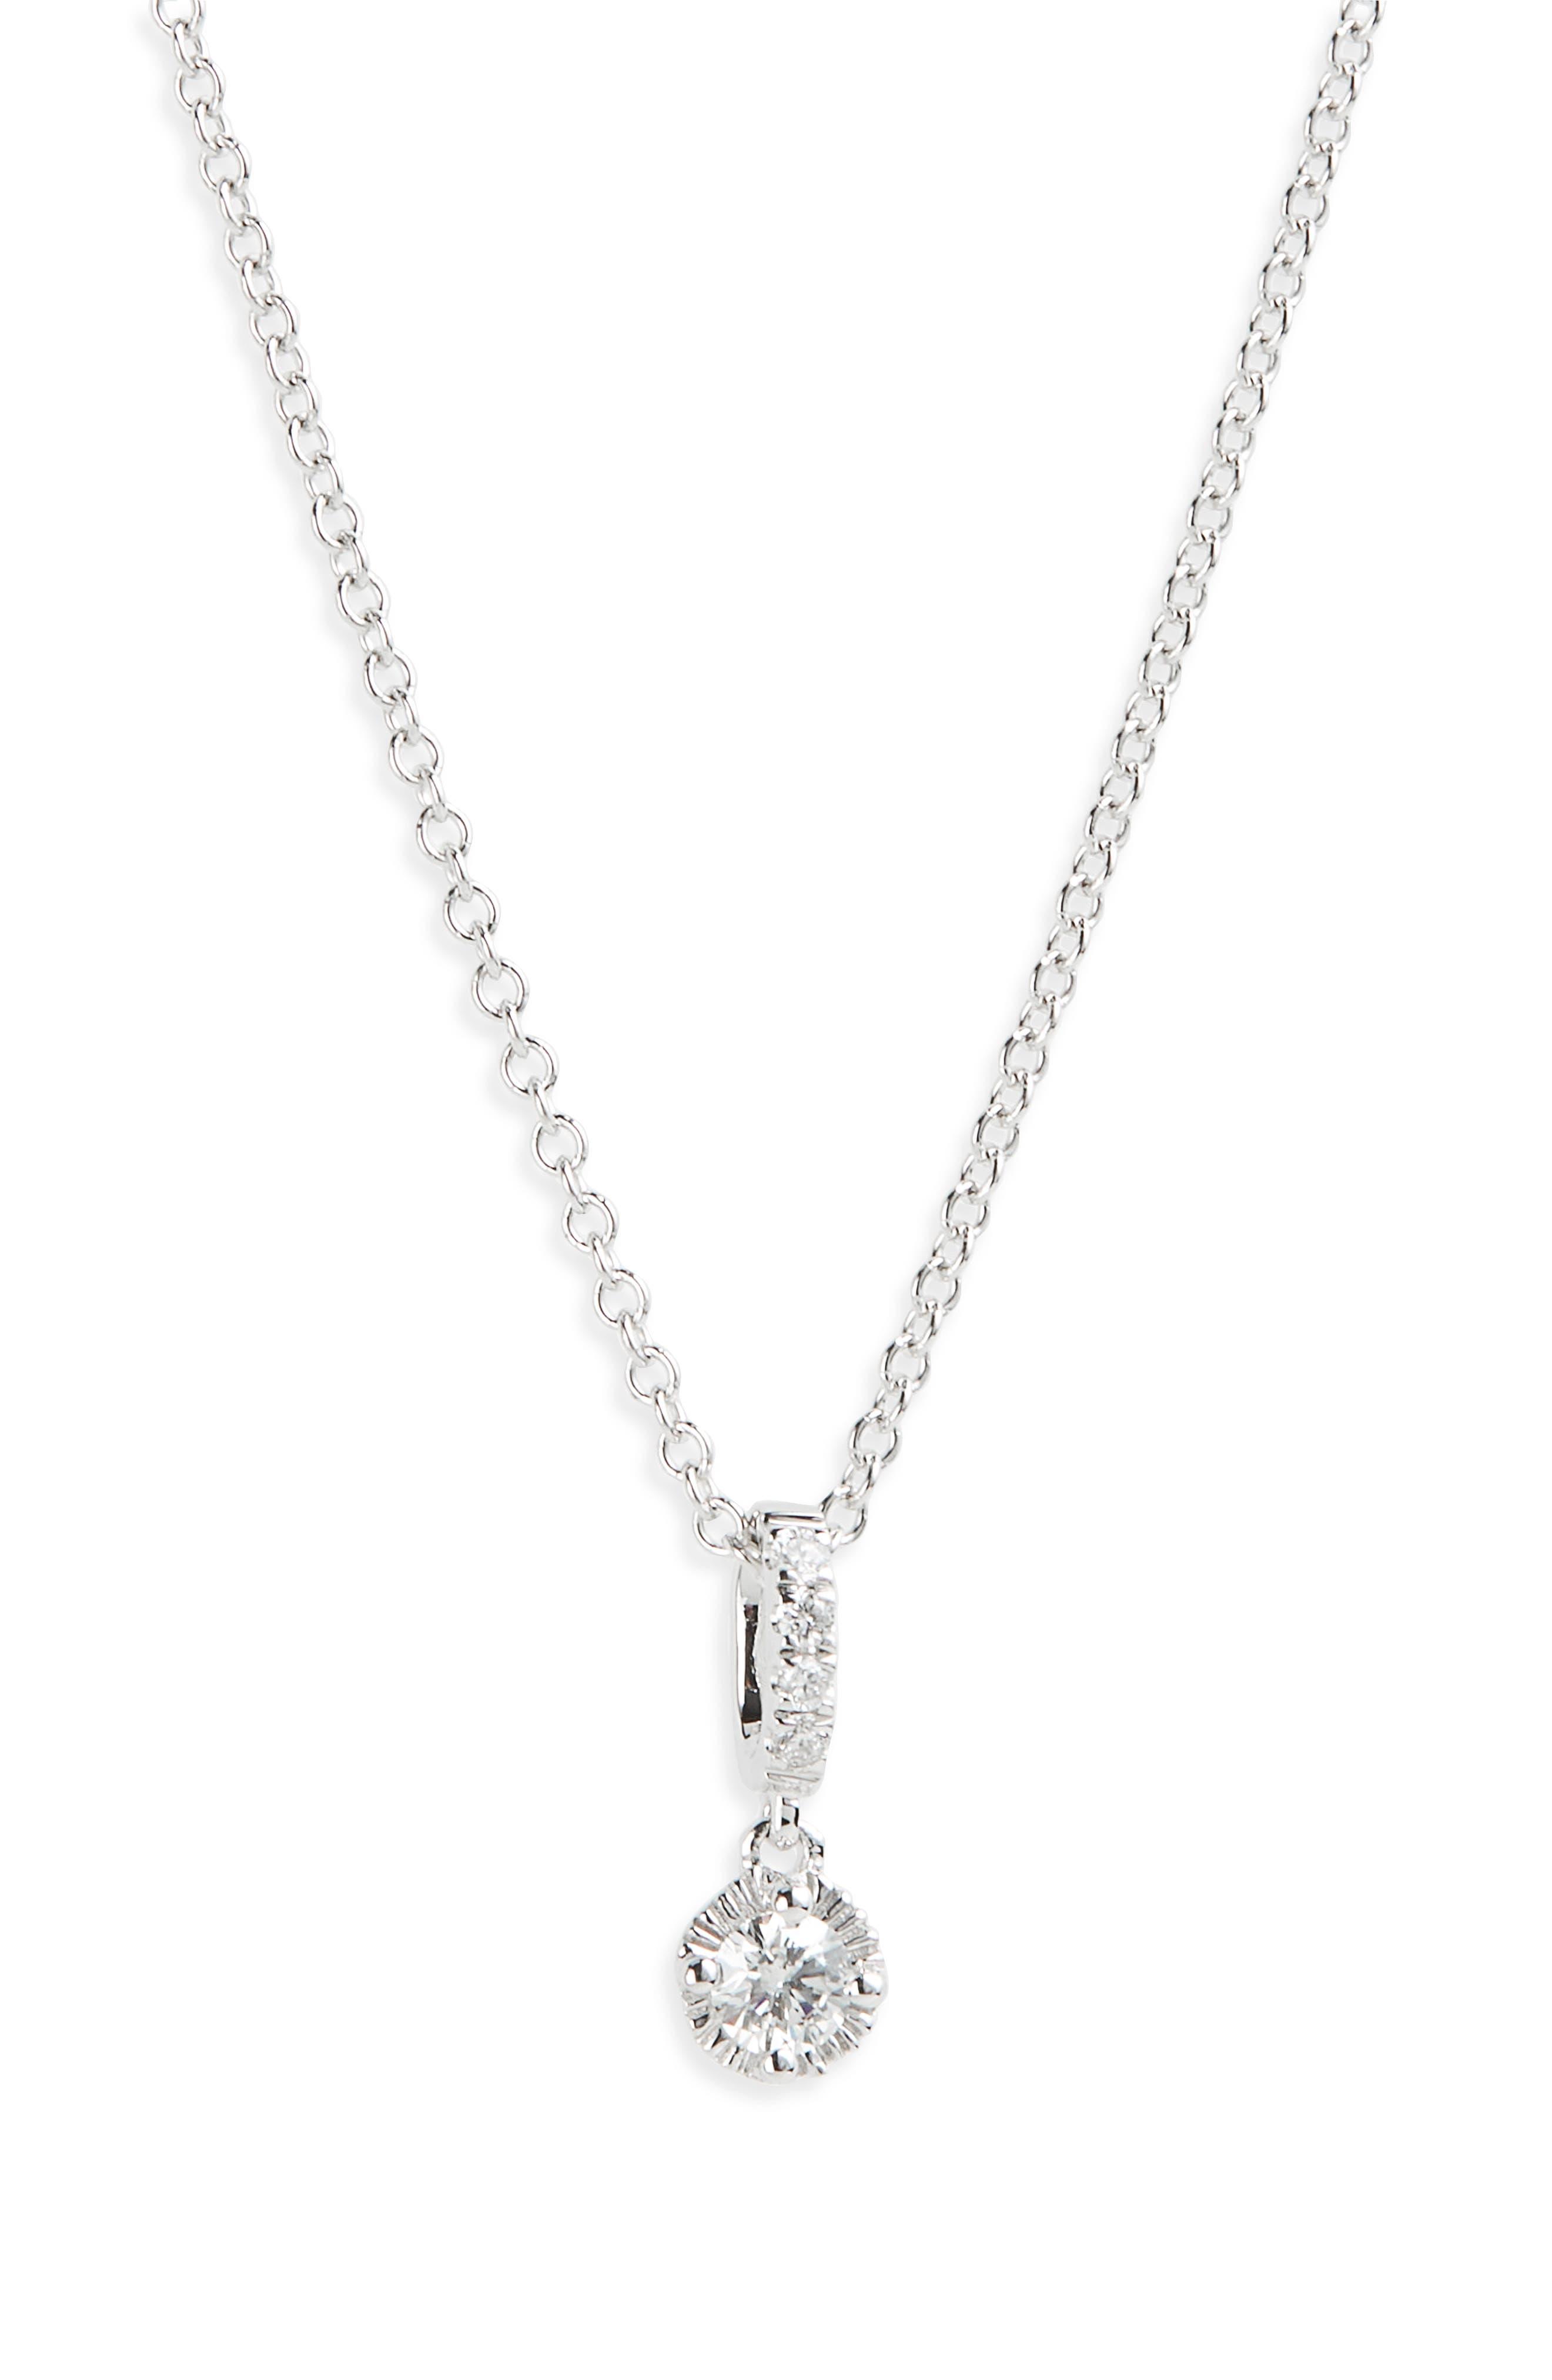 Mila Diamond Pendant Necklace,                             Main thumbnail 1, color,                             WHITE GOLD